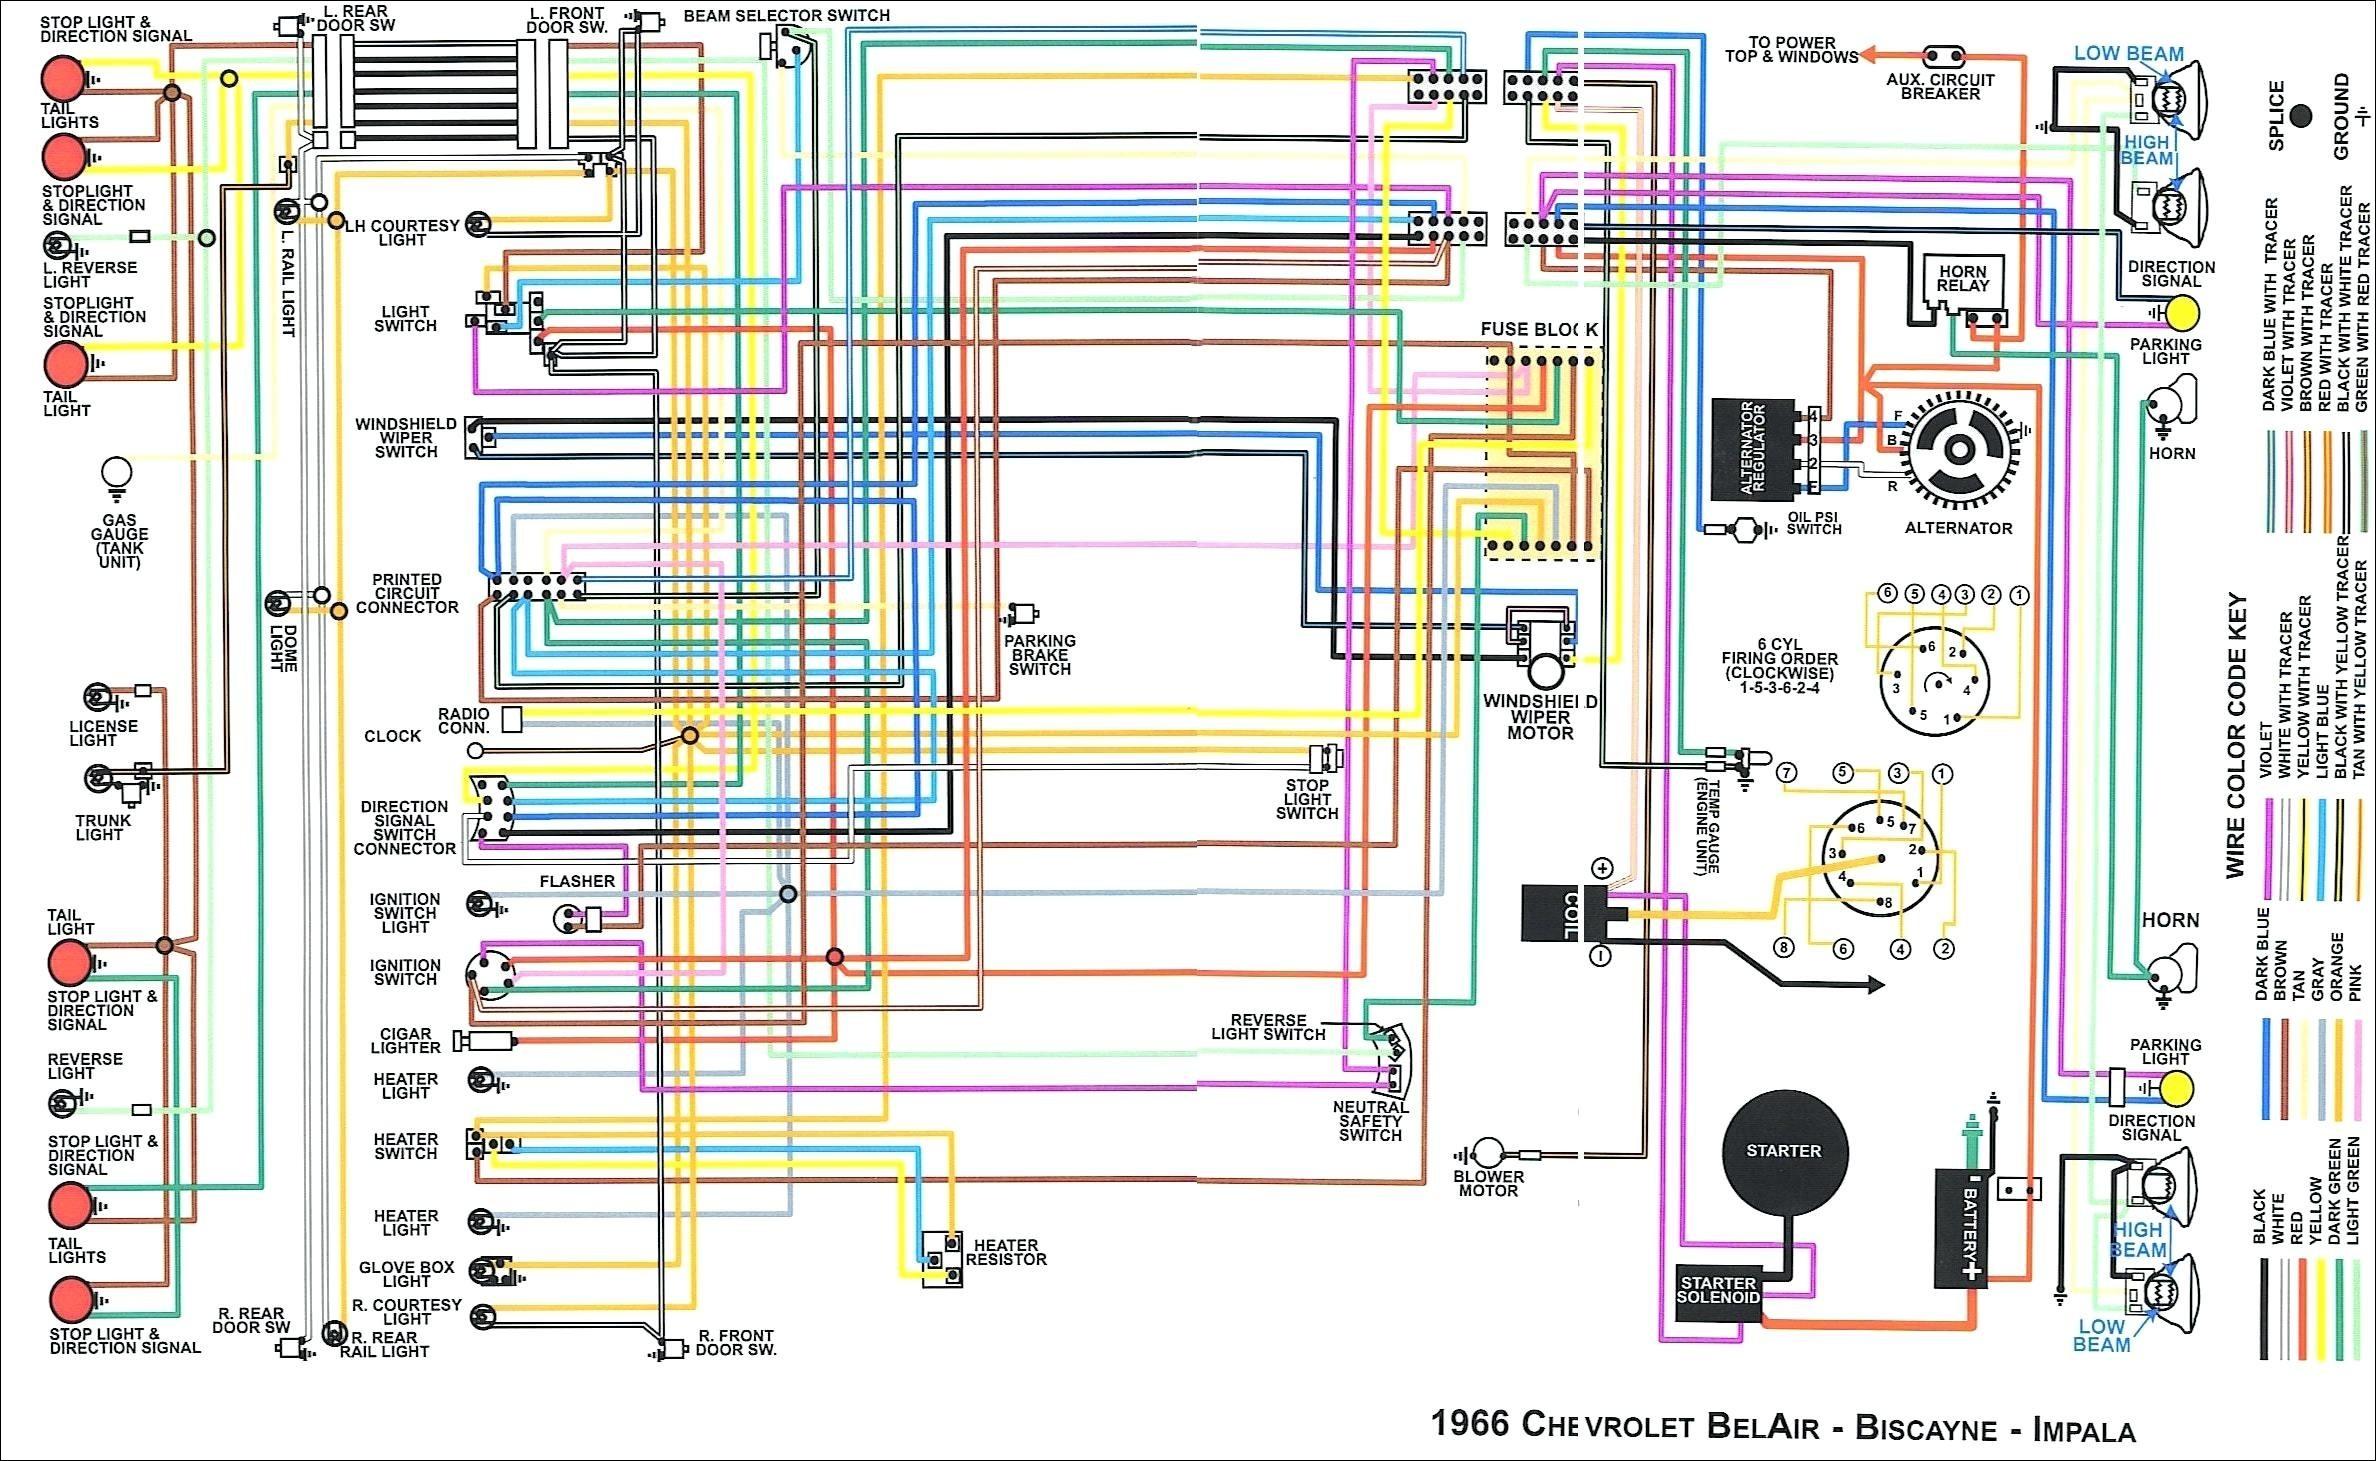 72 Chevelle Alternator Wiring Diagram 2001 Ford Aerostar Fuse Box Bege Wiring Diagram